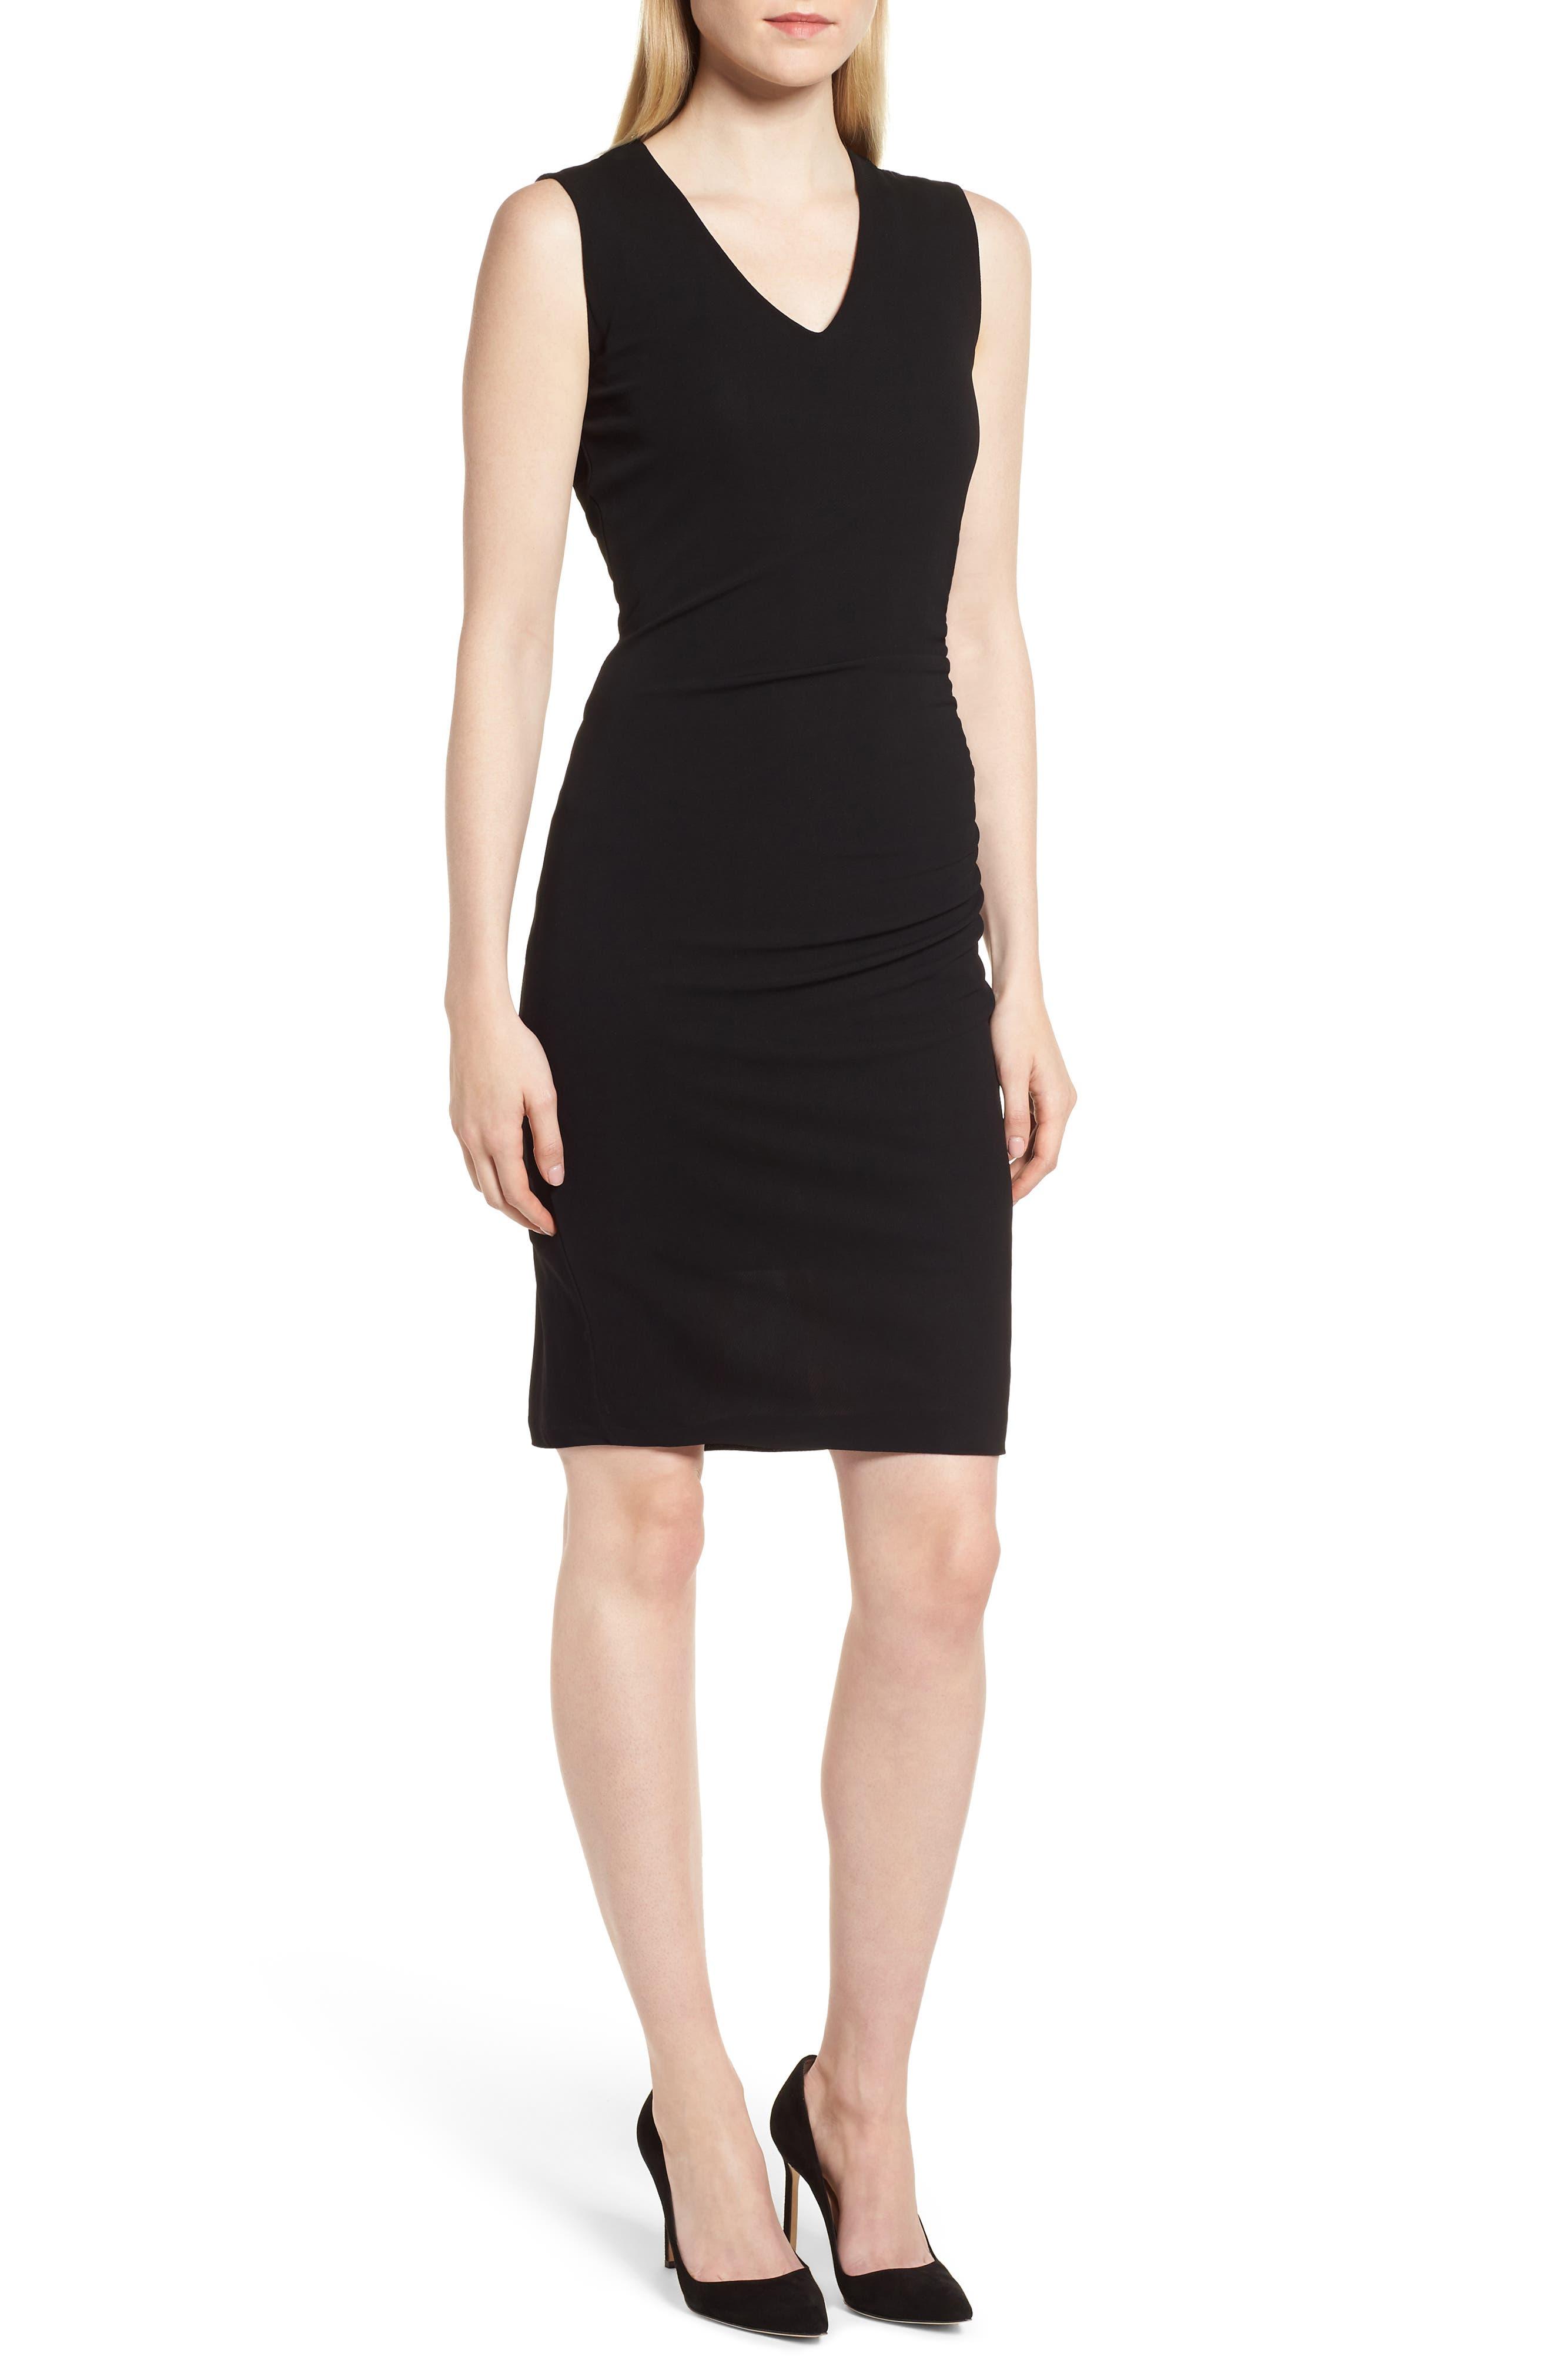 Erela Ruched Sheath Dress,                         Main,                         color, Black